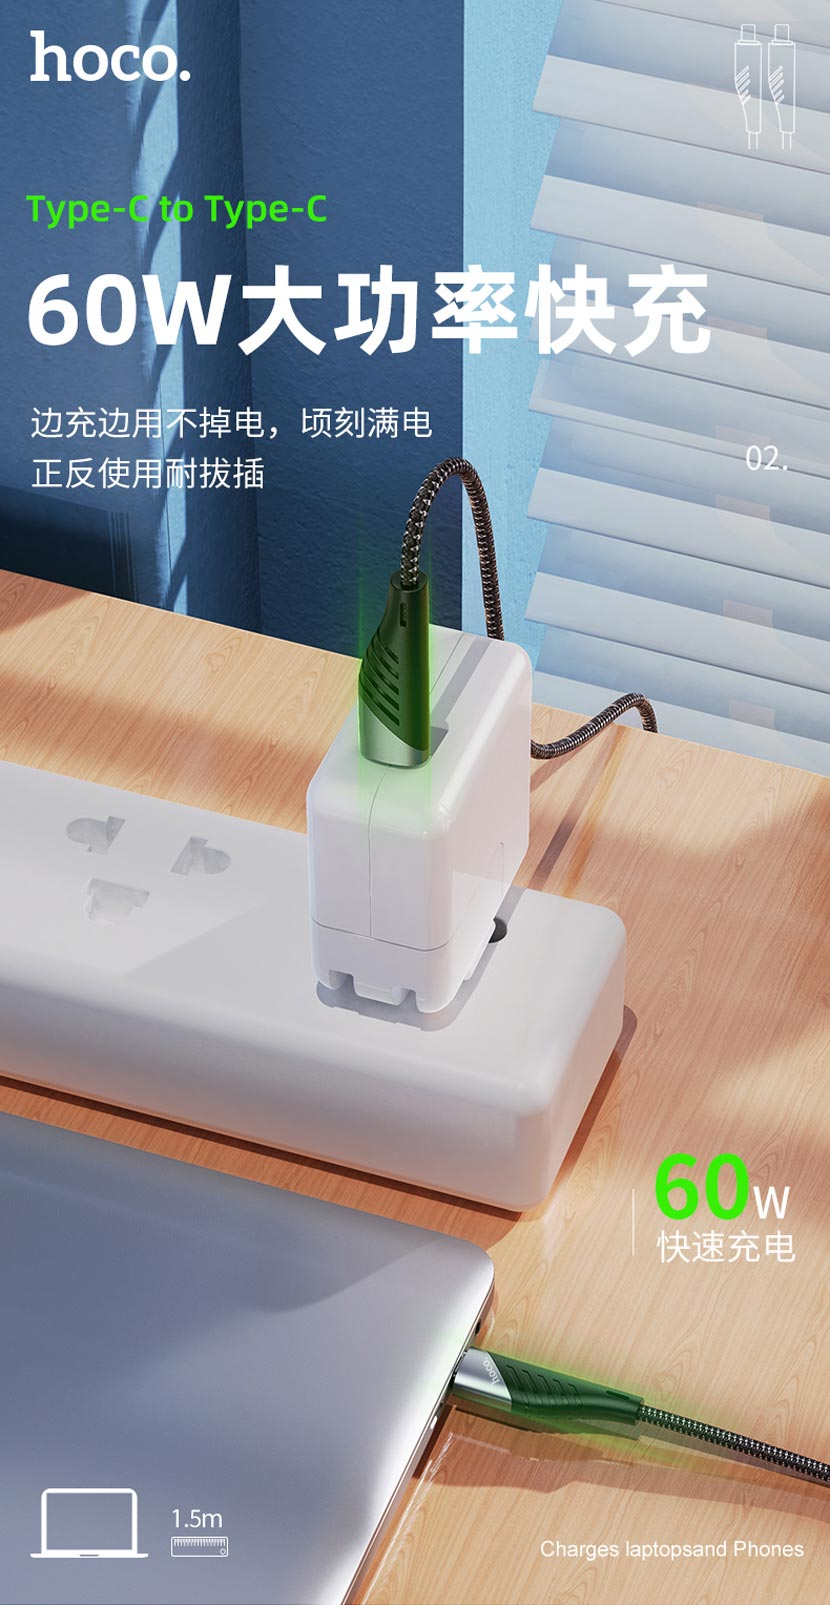 hoco news u95 freeway charging data cable 60w type c to type c cn